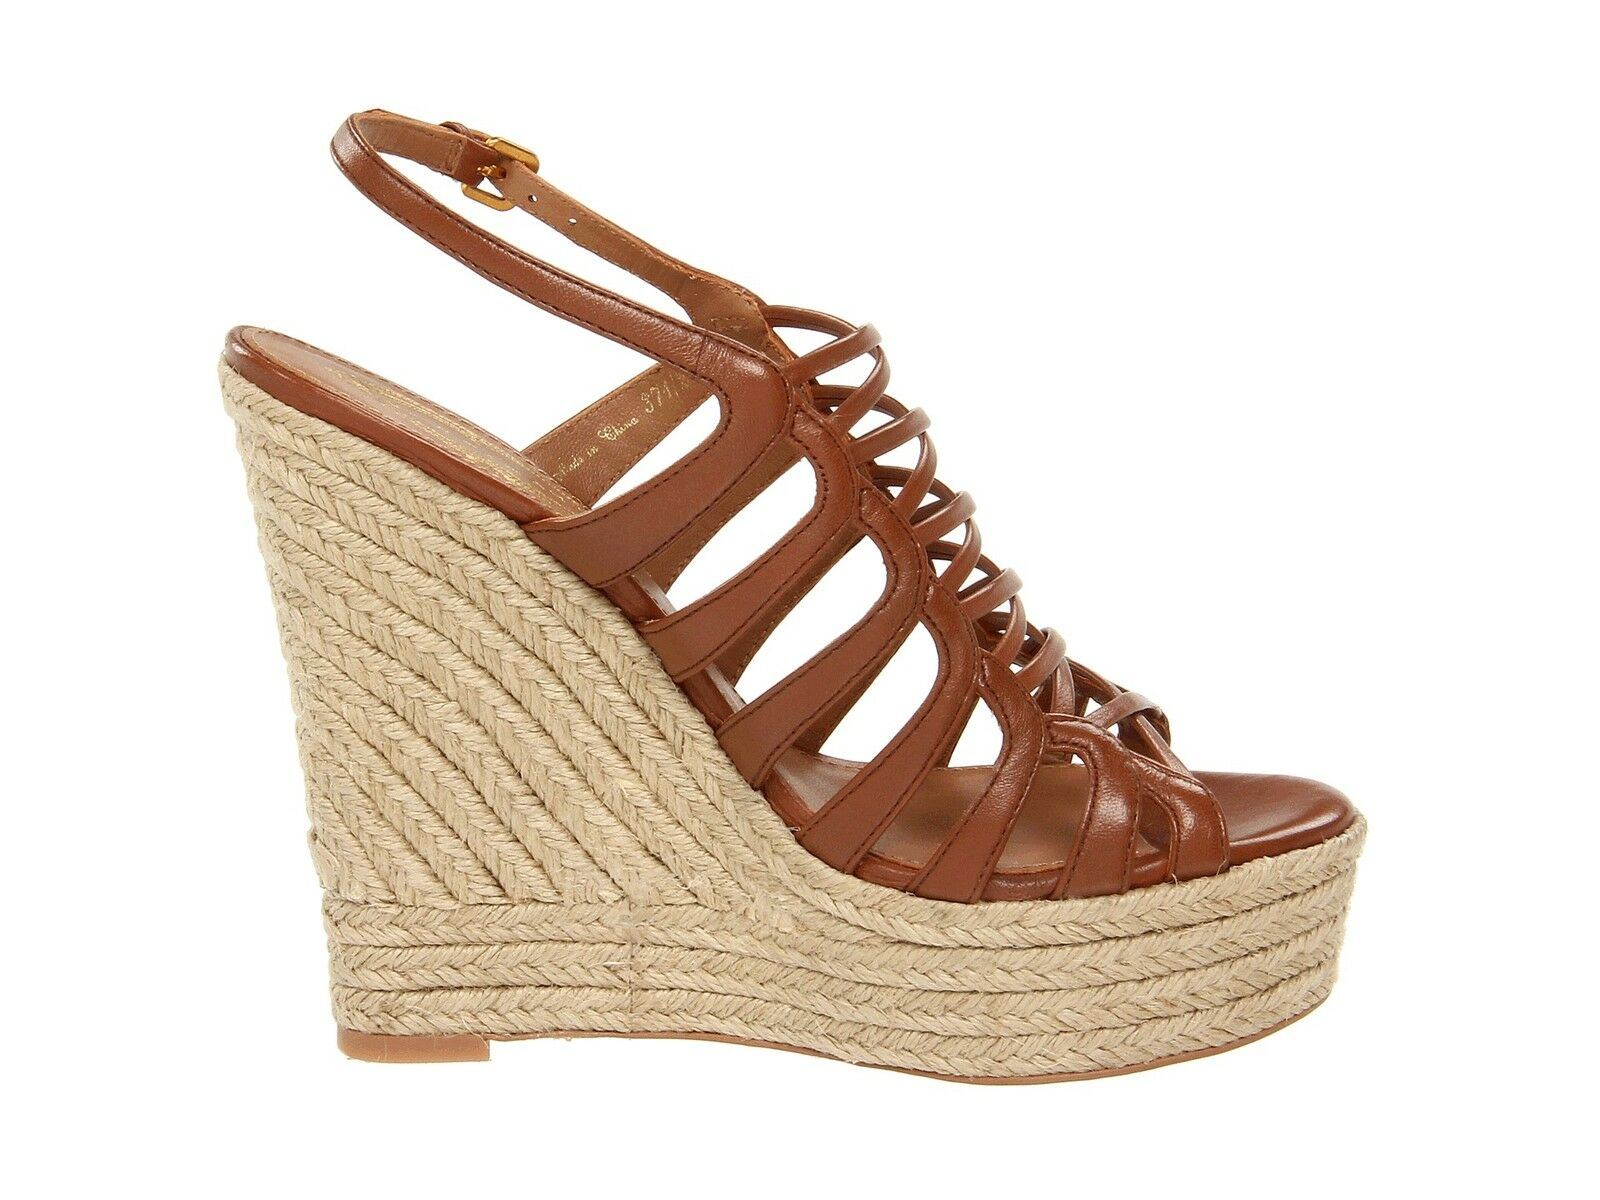 278 Elie Tahari  Weaver Espadrille  Braun Woven Slide Wedge Sandale  Schuhe 39.5-9